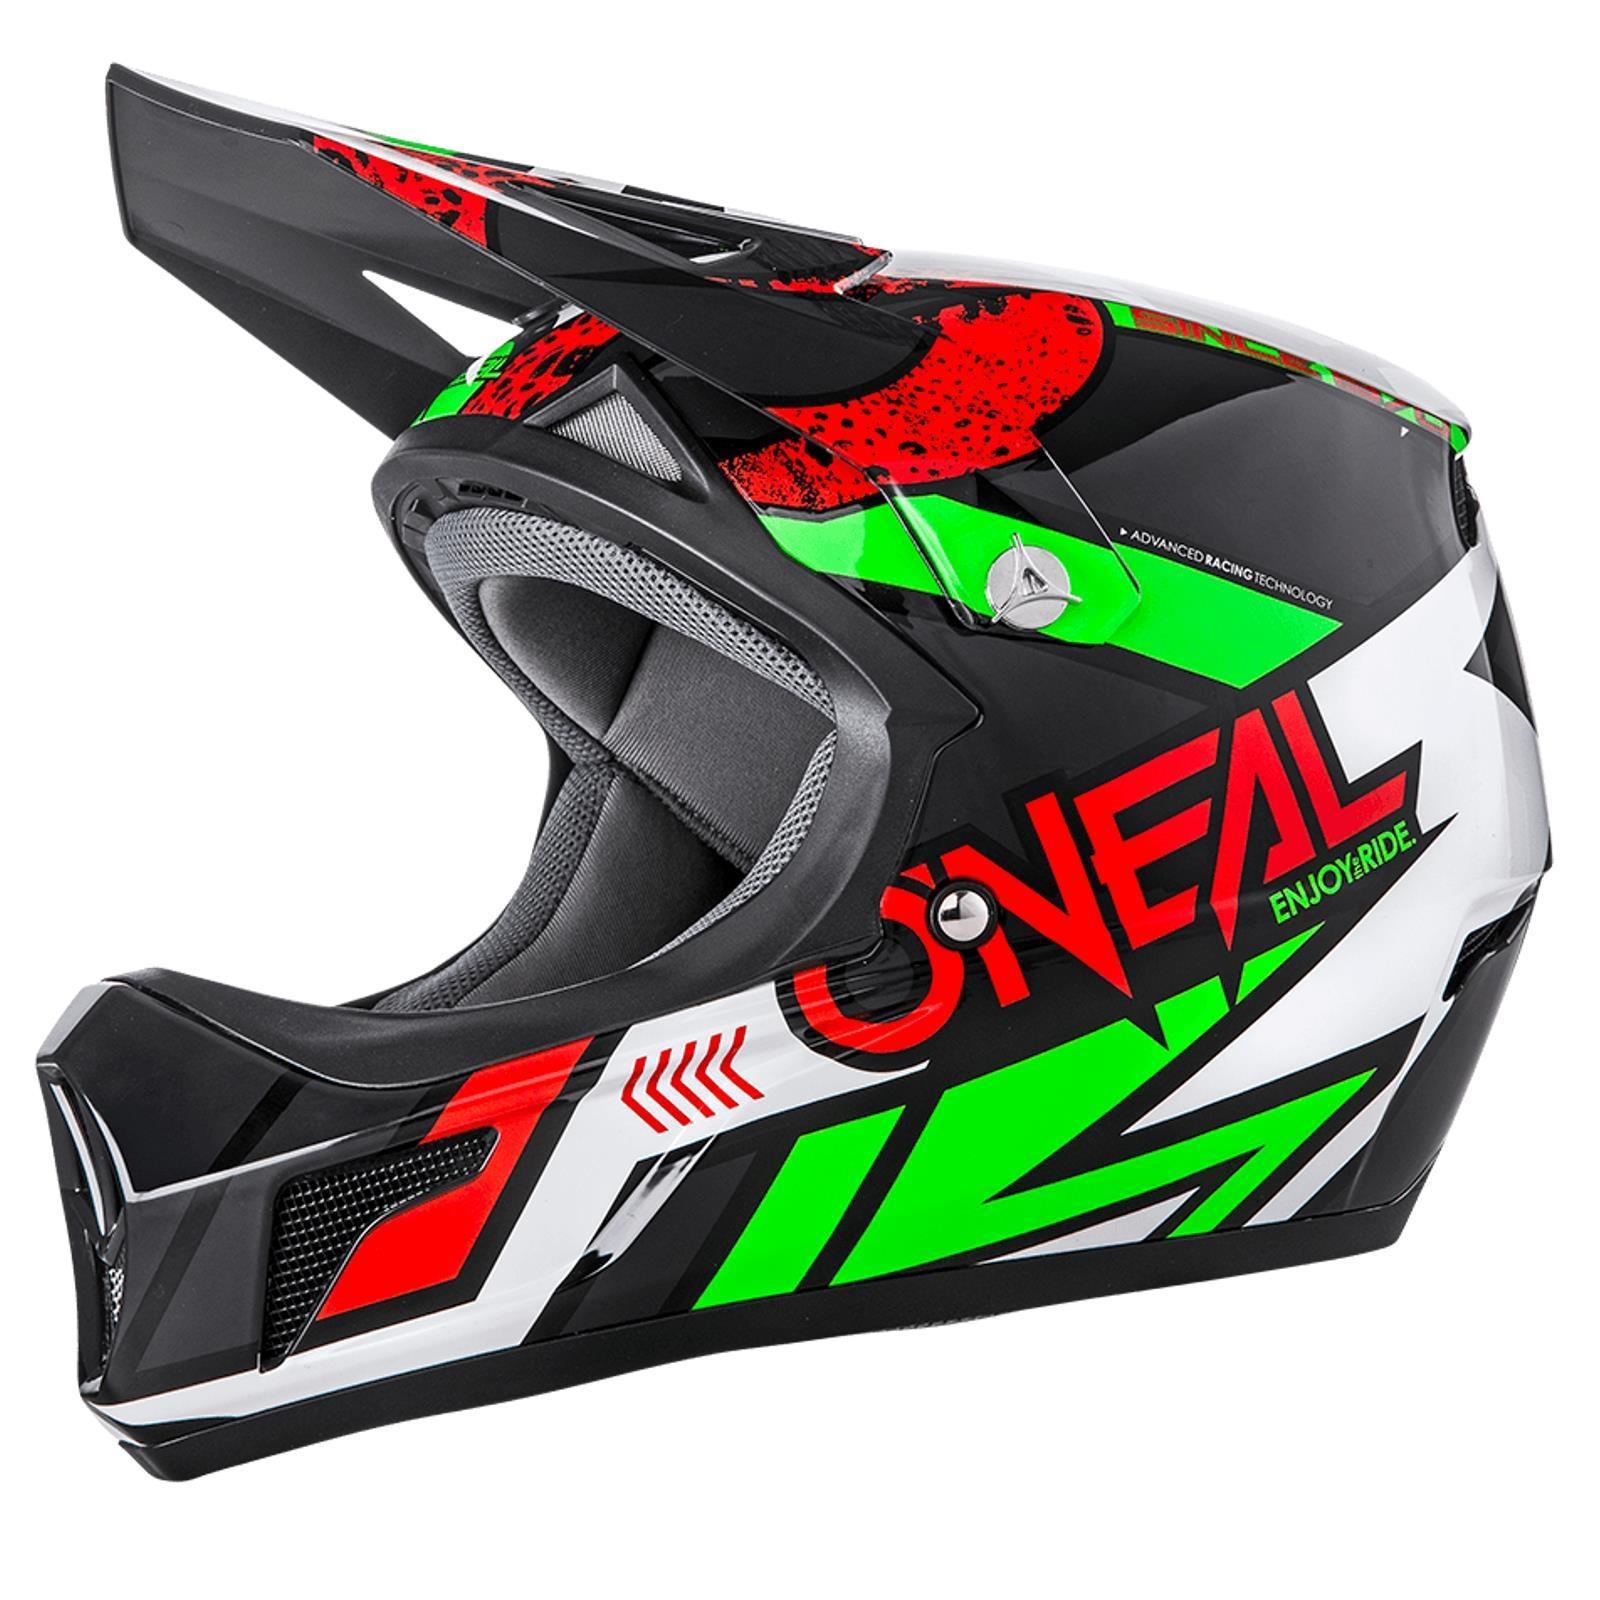 Indexbild 12 - ONeal-Sonus-Strike-Fahrrad-Helm-All-Mountain-Bike-MTB-Downhill-Fullface-Fidlock